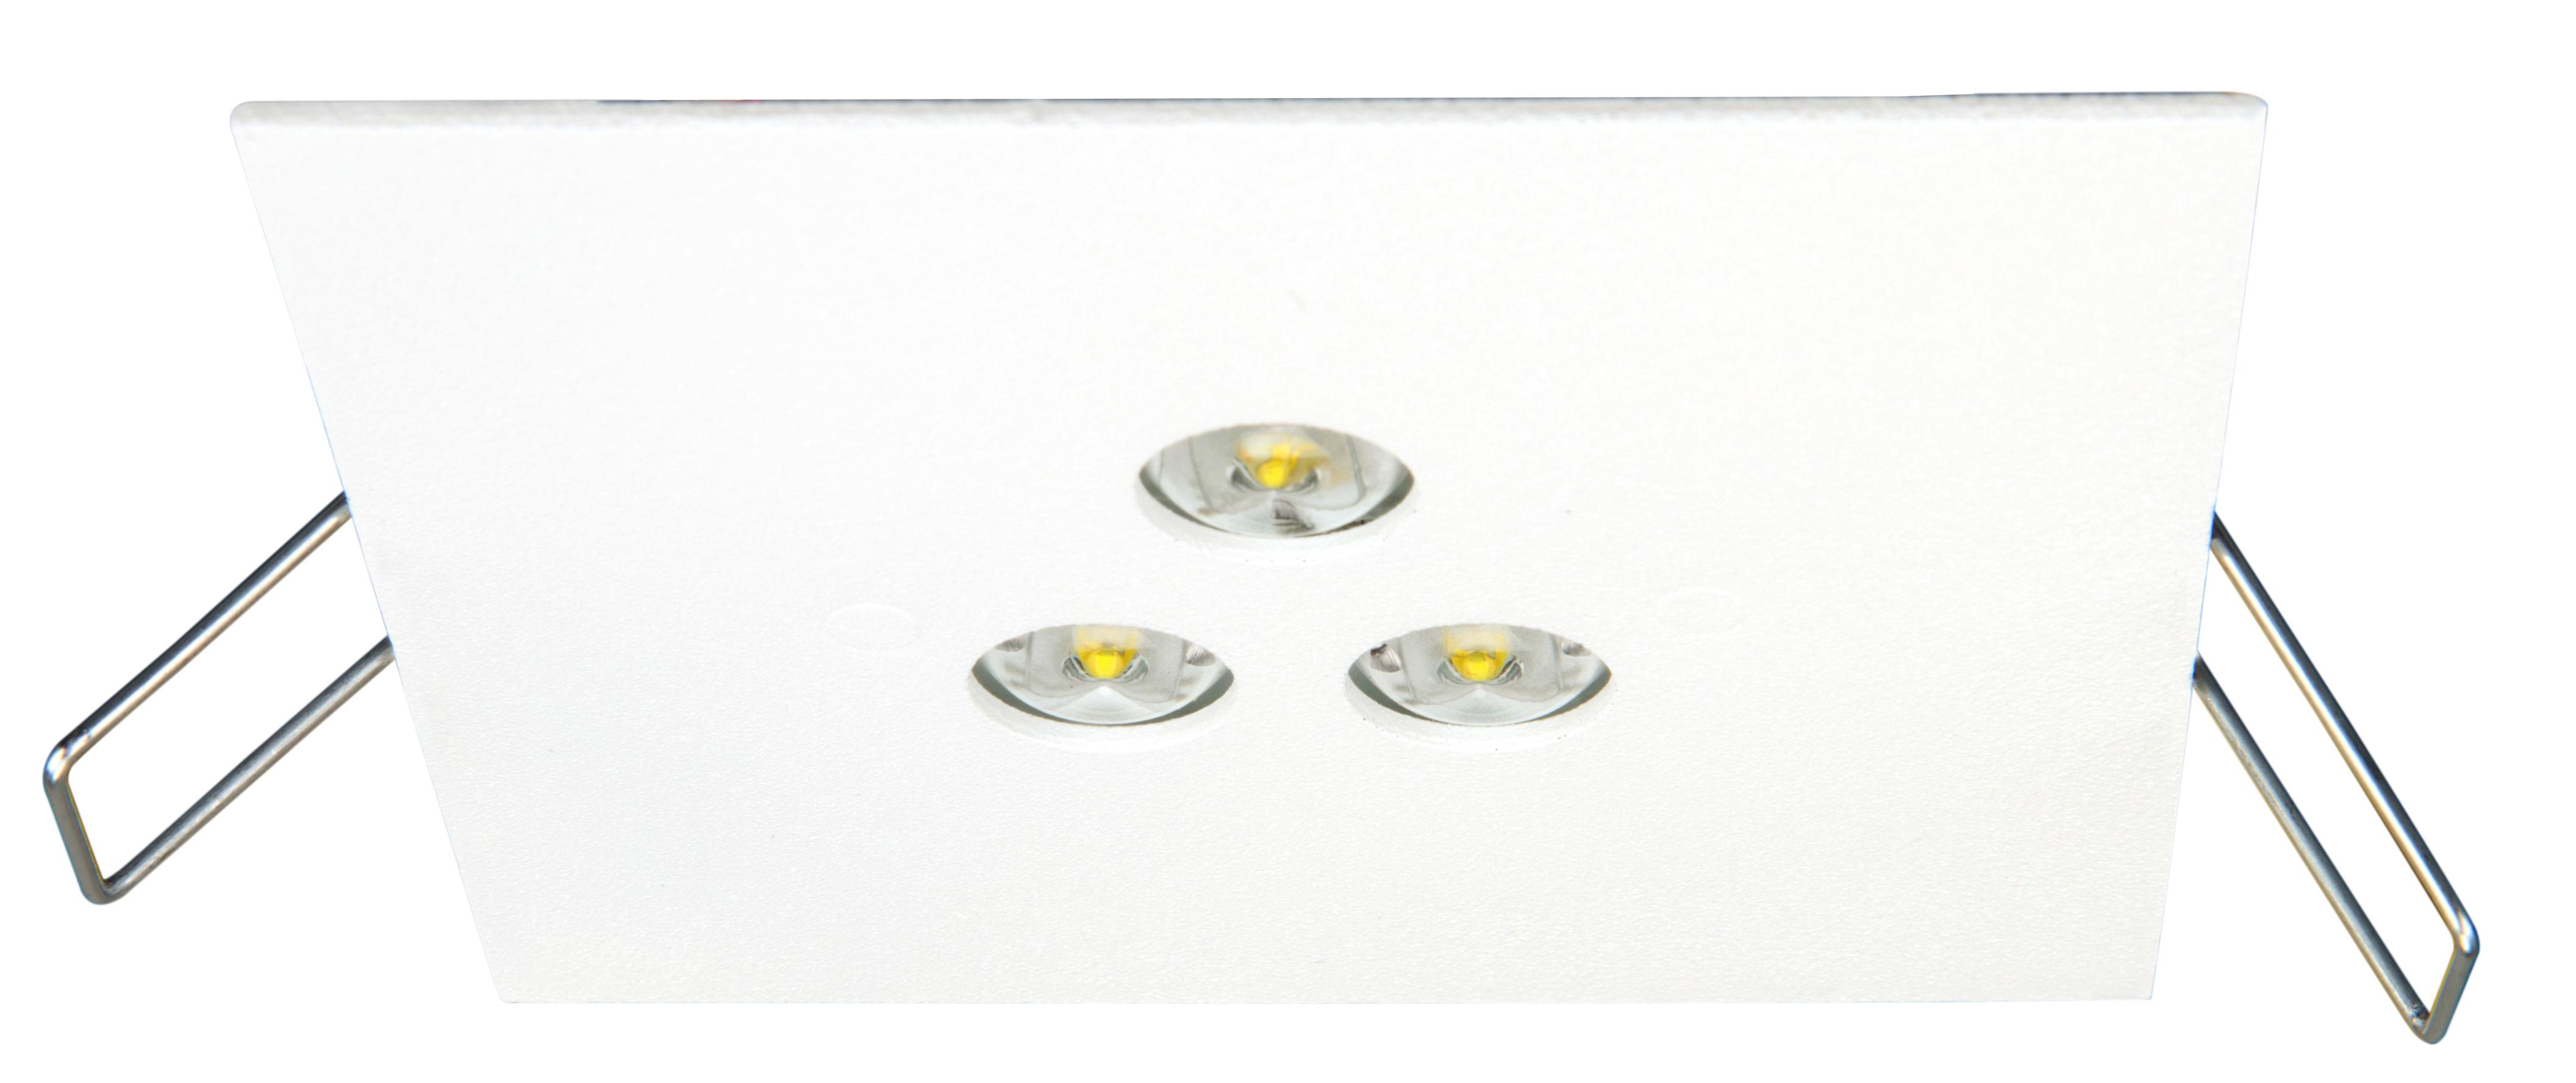 1 Stk Notleuchte DEQ Autotest 3x1W ERT-LED 3h 230VAC NLDEQ023SC